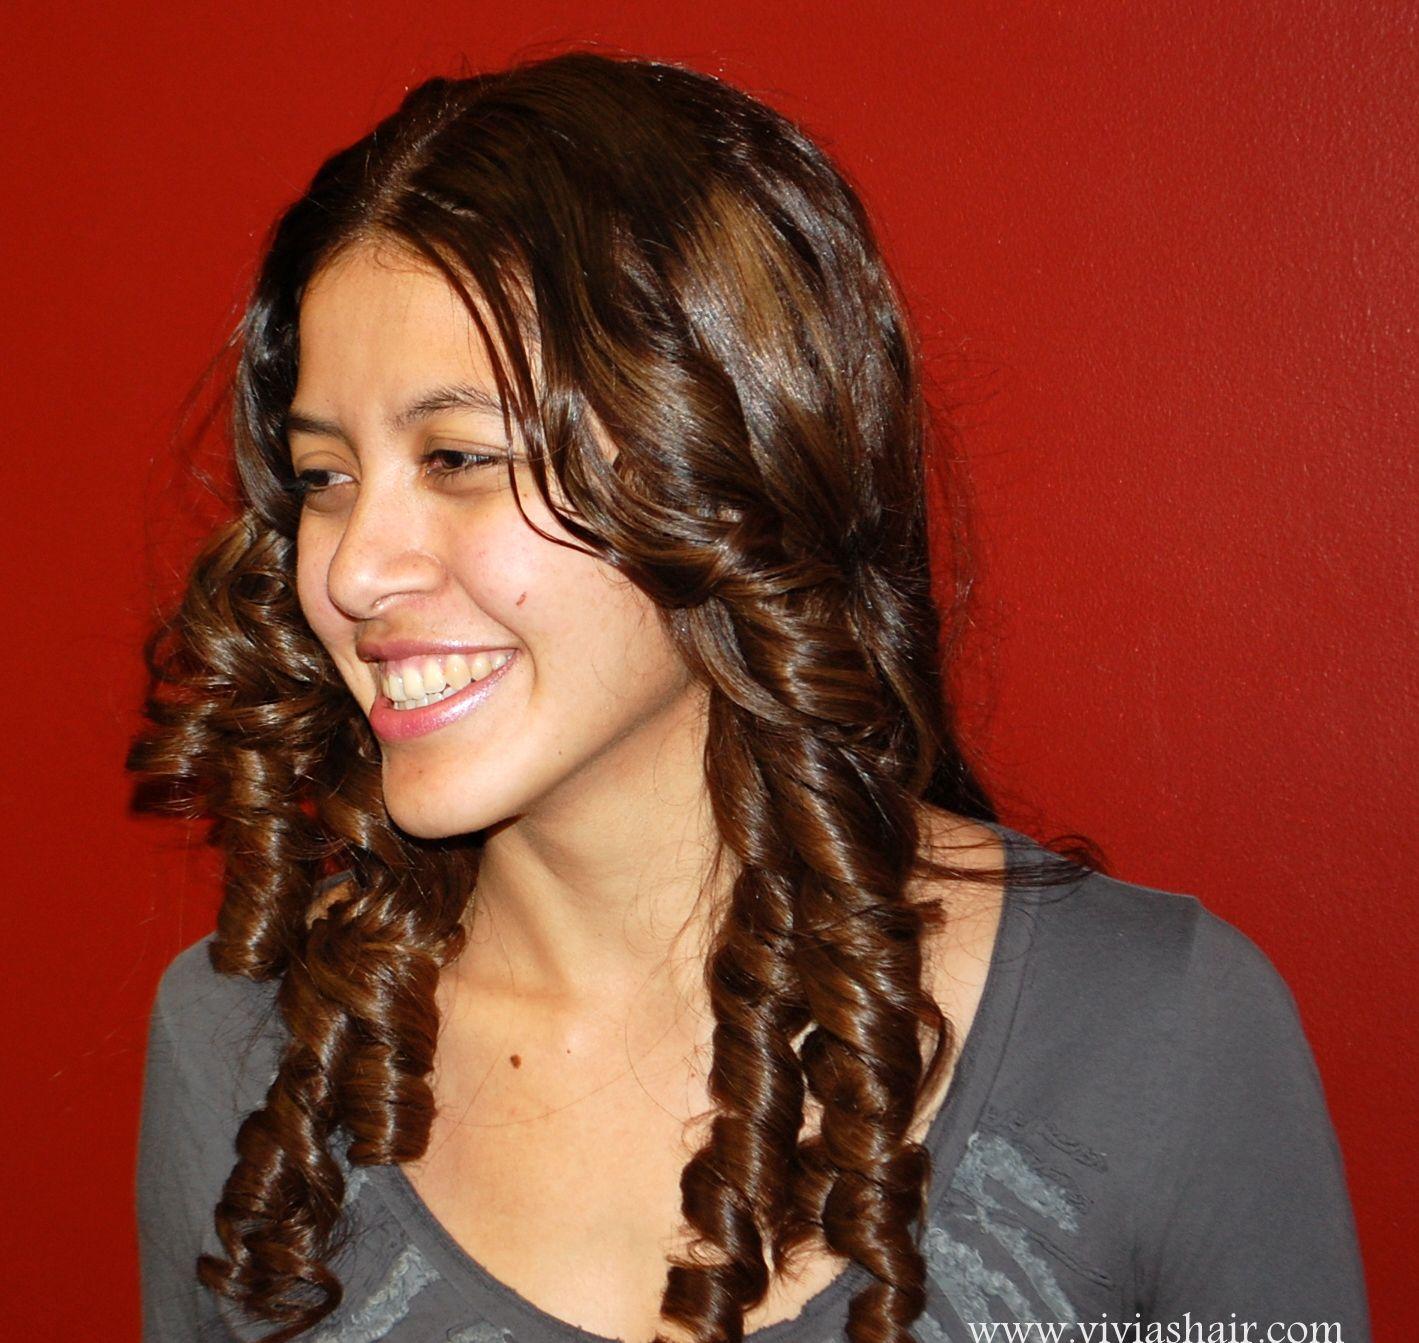 Hair Extensions Salon Va Hair Salon Woodbridge Va Hair Salon